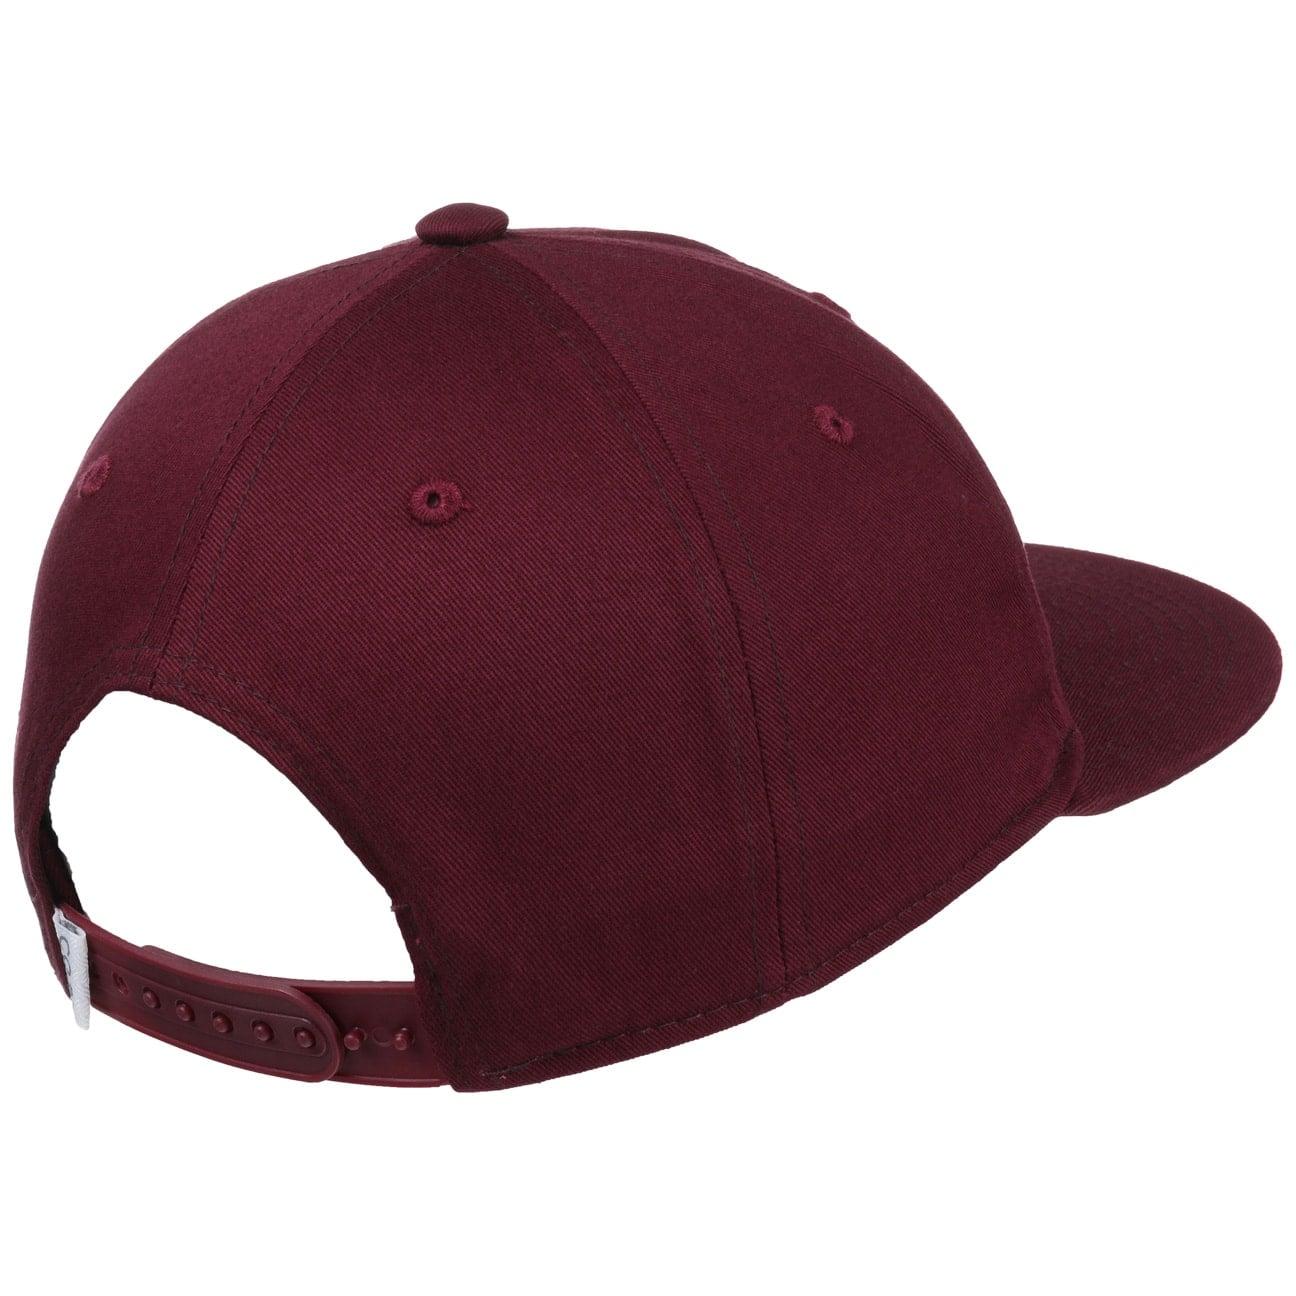 716e1f1e686 ... The Junior Snapback Cap by Coal - bordeaux 4 ...